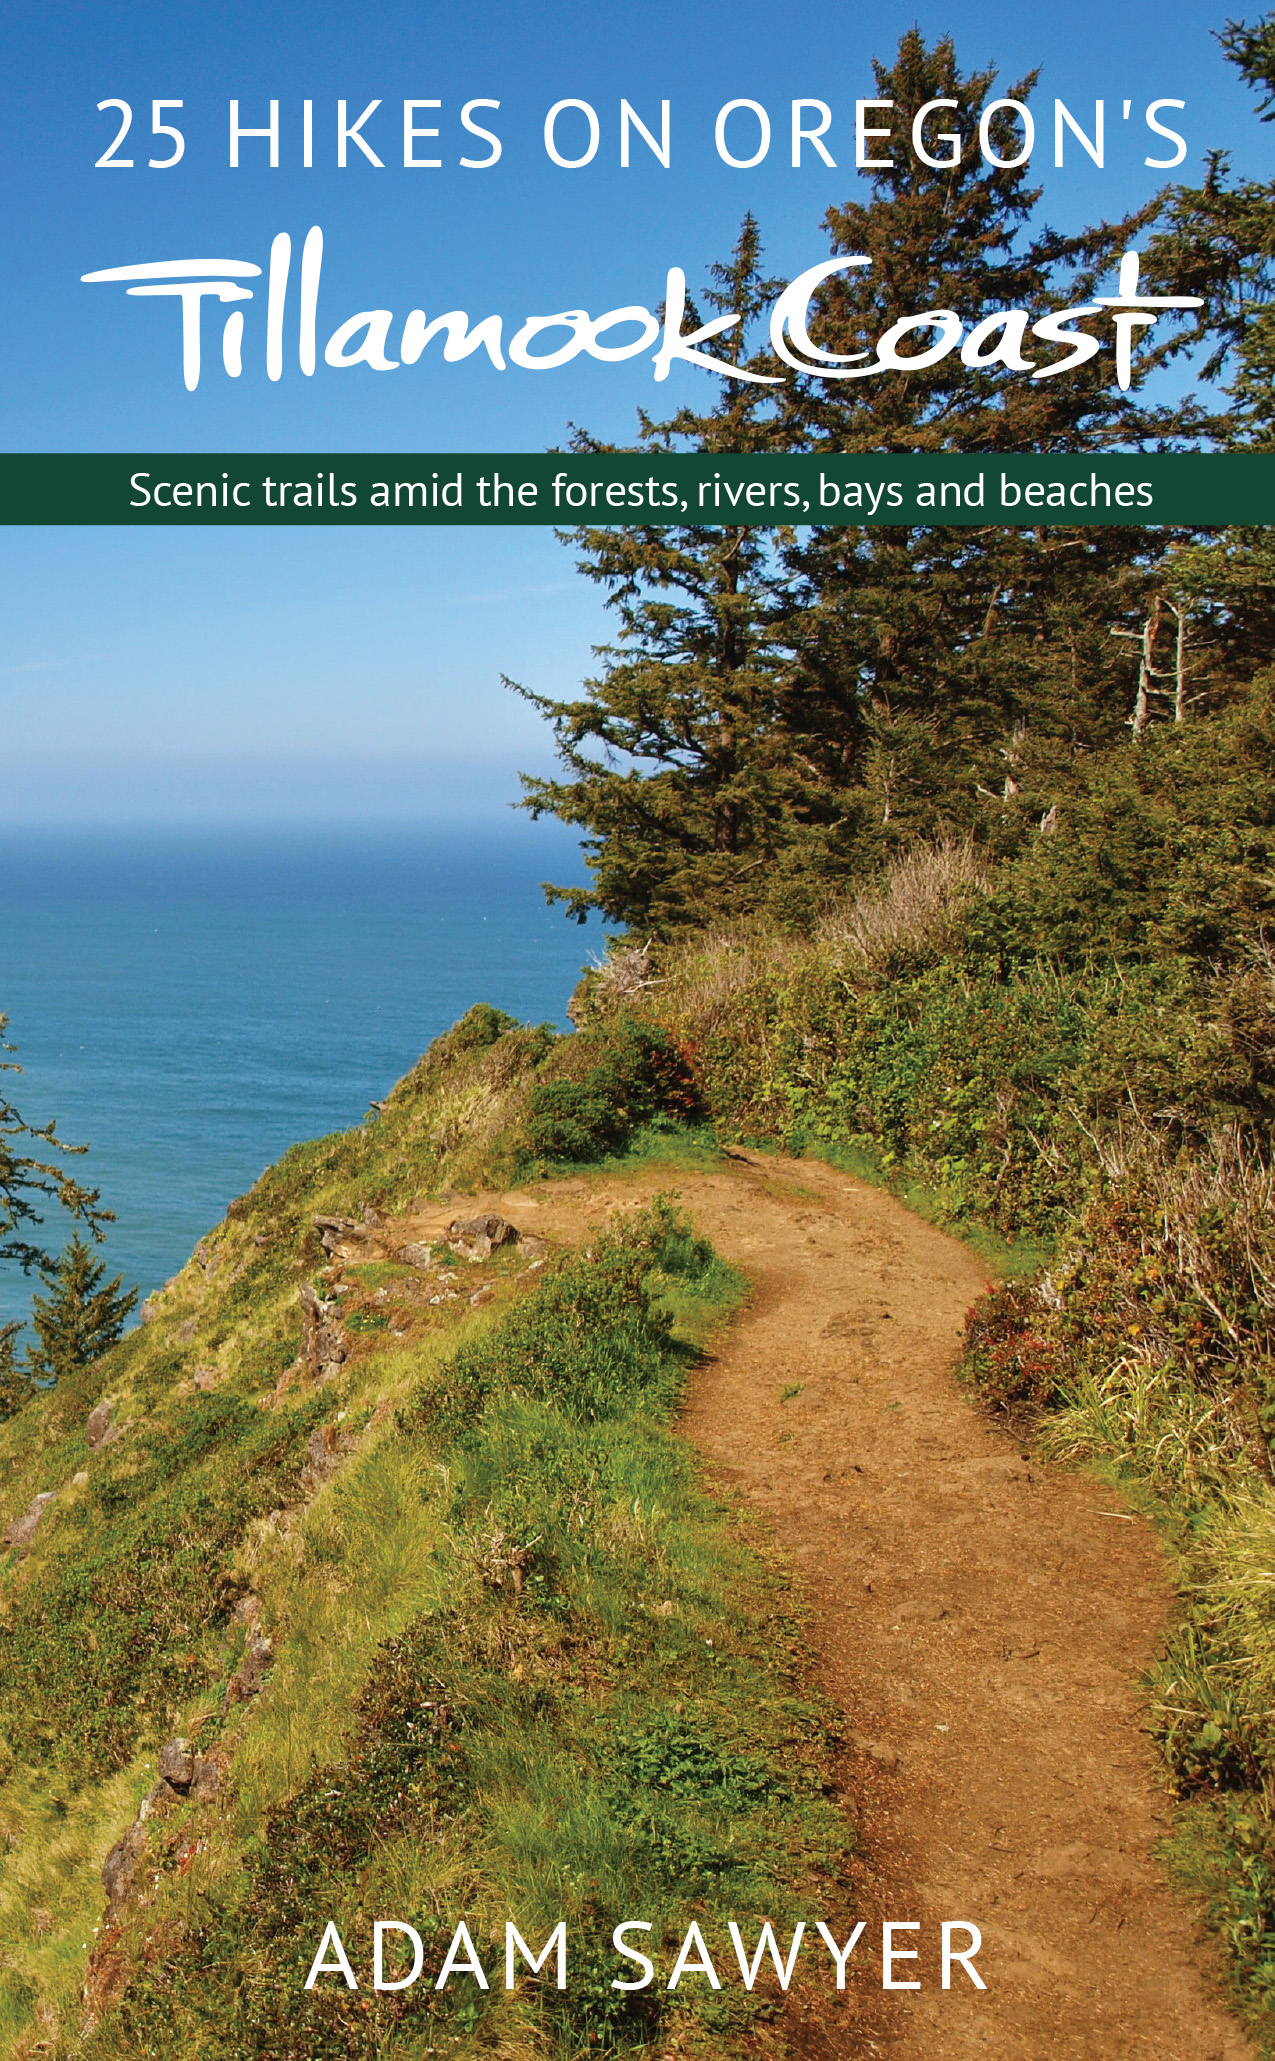 25 Hikes on Oregon's Tillamook Coast (Tillamook Coast Oregon, 2017)